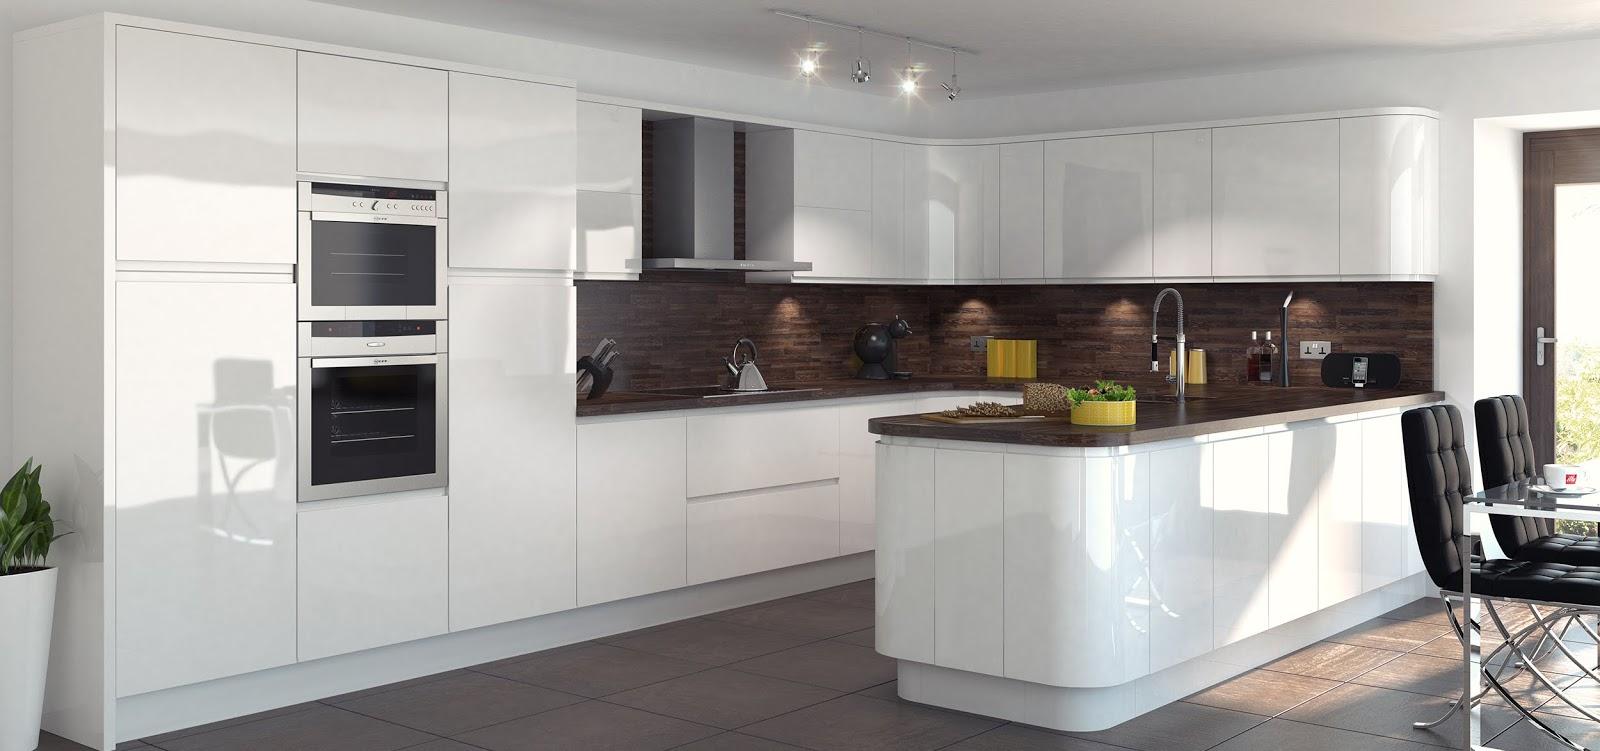 The Kitchen Studio - Fitted Kitchens | Essex | Bedfordshire